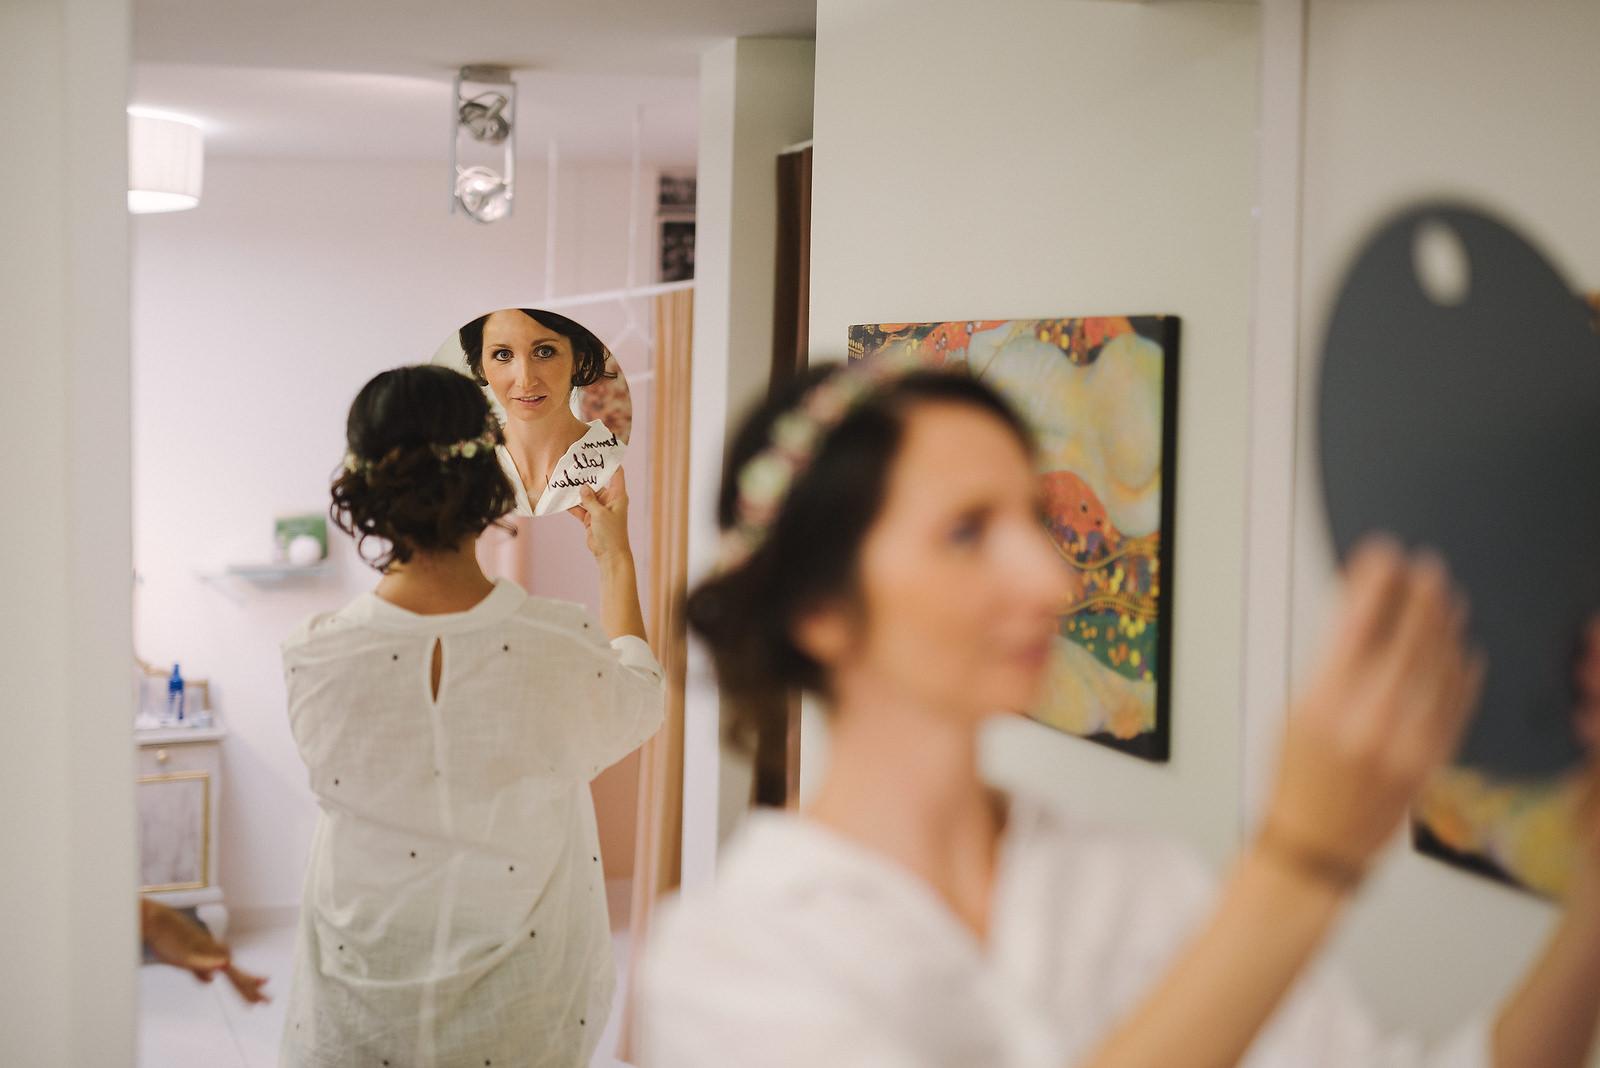 Fotograf Konstanz - Hochzeitsfotograf Reutlingen Achalm Hochzeit EFP 03 - Als Hochzeitsfotograf auf der Achalm, Reutlingen  - 3 -